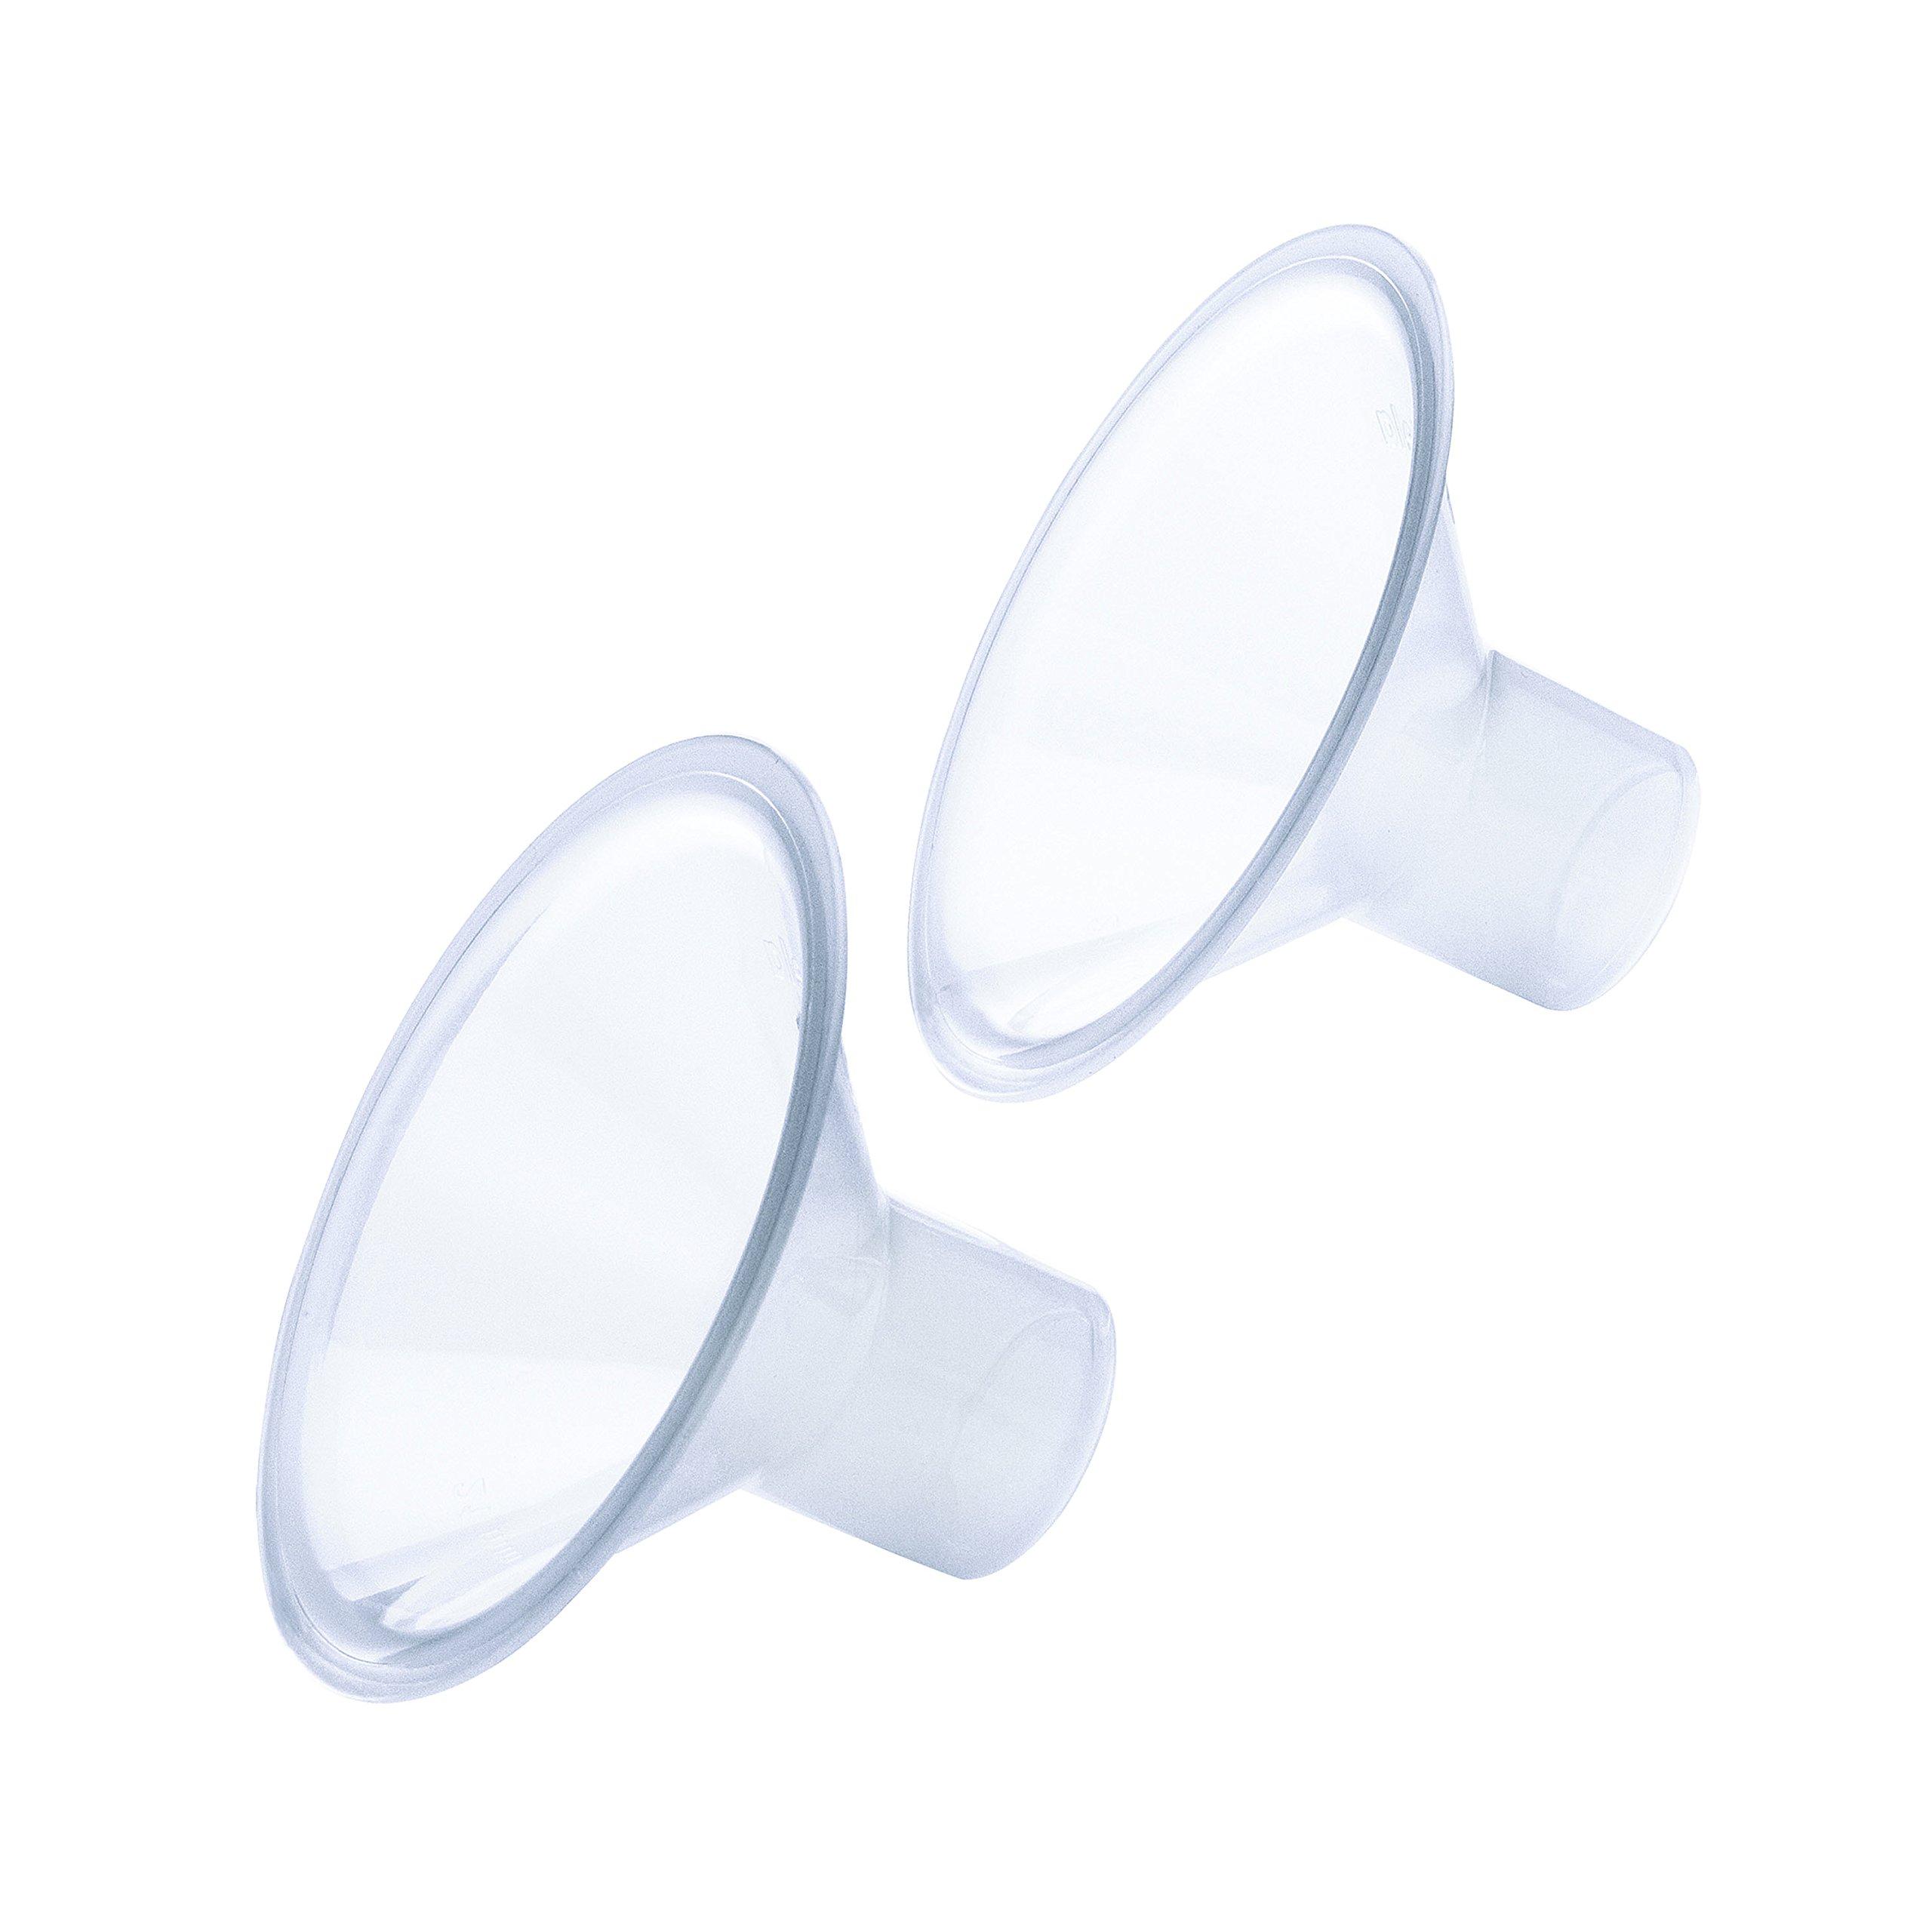 Medela PersonalFit Breast Shield, 21 mm